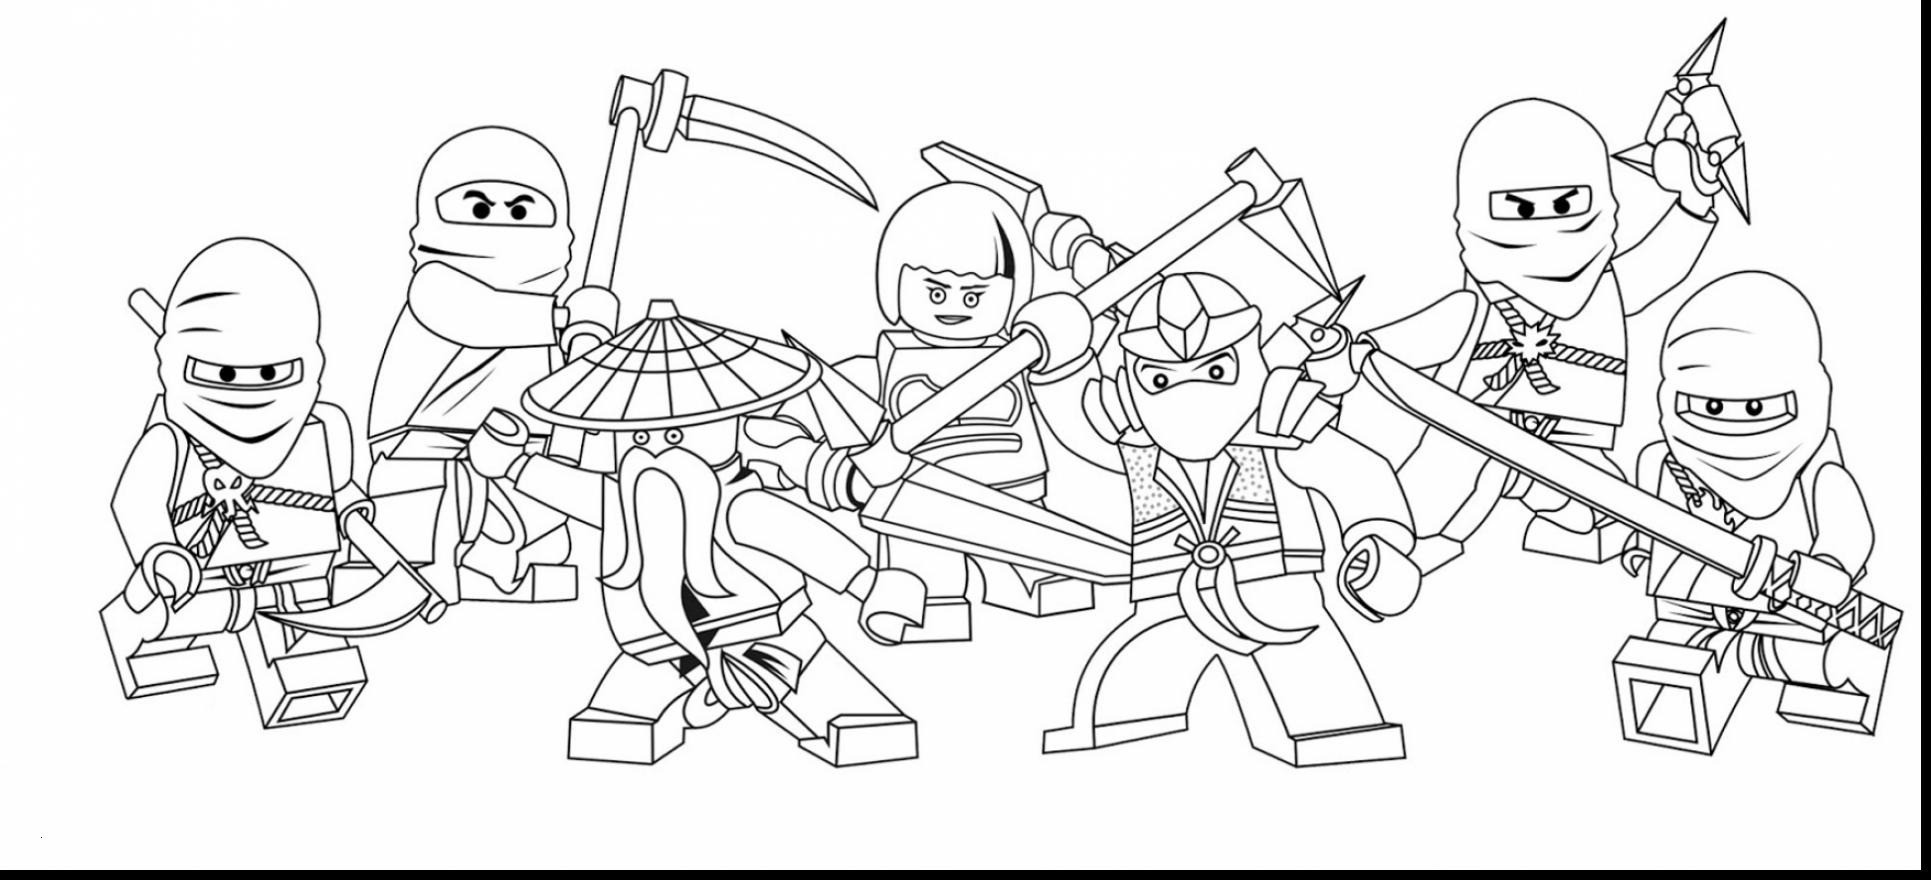 Ausmalbild Ninjago Drache Inspirierend 32 Ausmalbilder Ninjago Drache forstergallery Bild